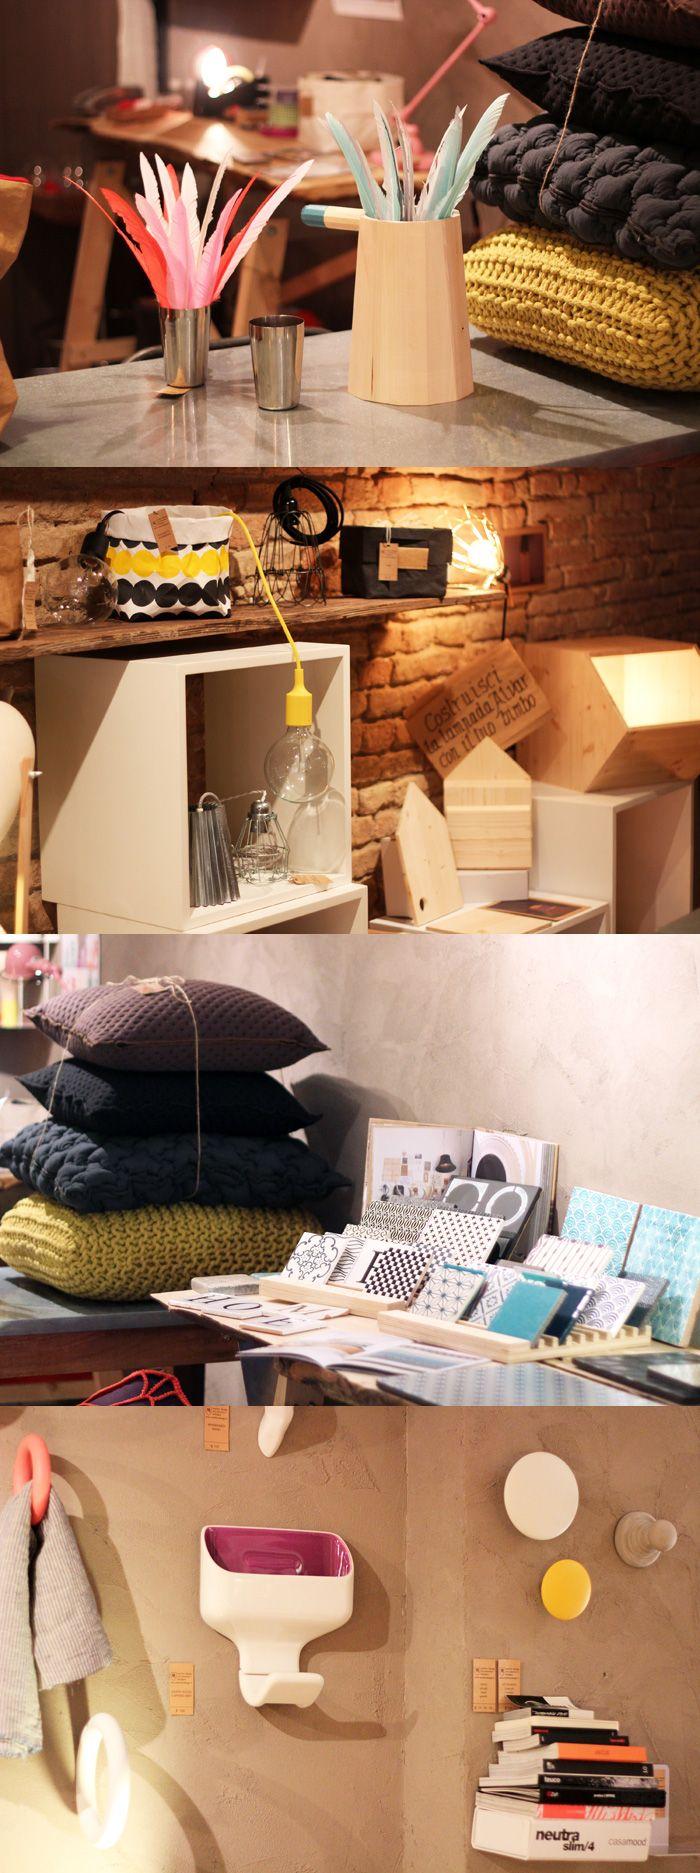 MARTINO DESIGN Design, Arredamento via Canonica 1/A - Bologna http://shoppingroutes.it/